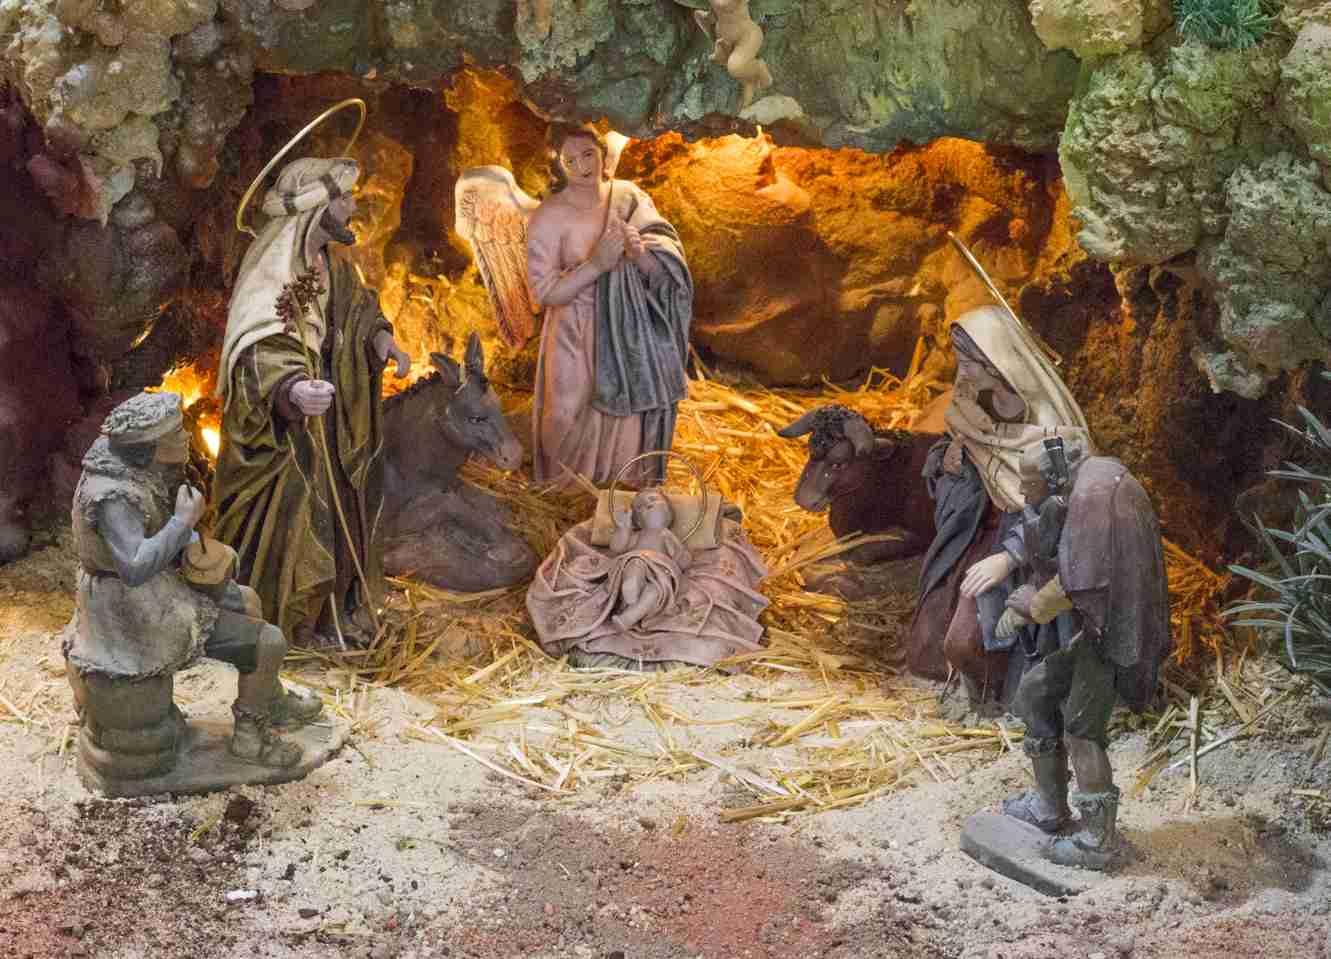 Belén – The Spanish Nativity